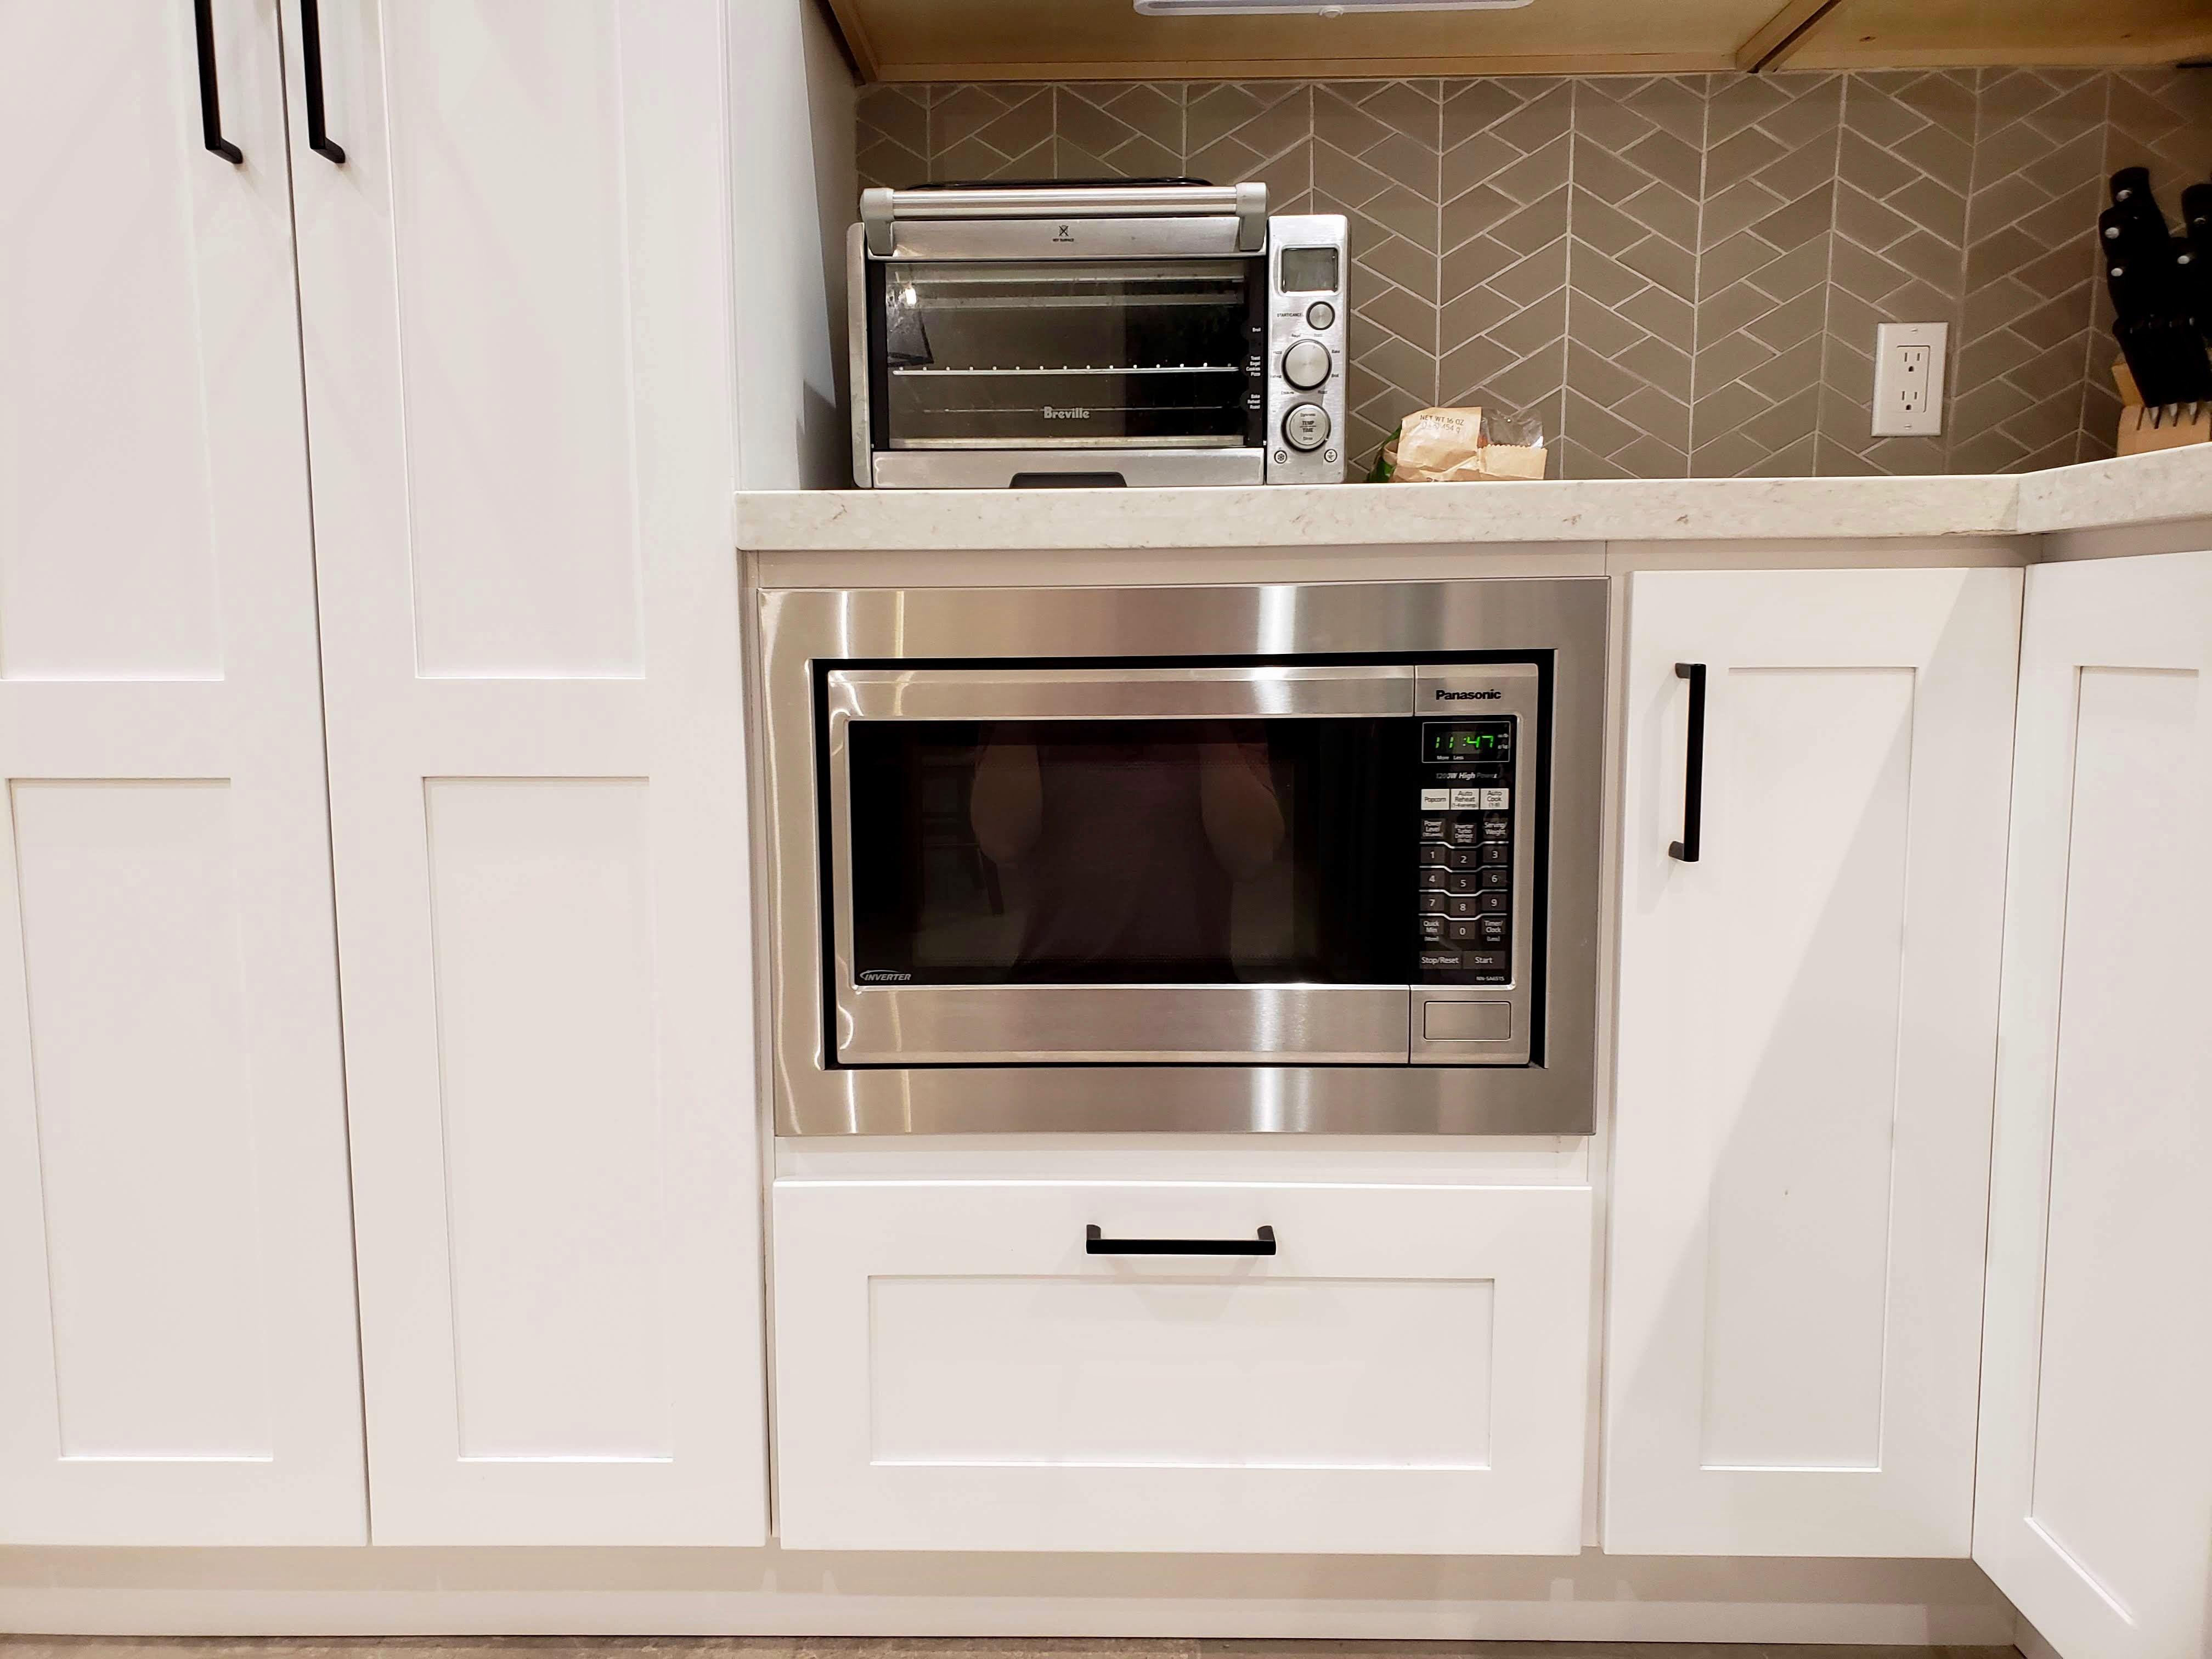 24 Standard Trim Kit For A Kitchenaid Microwave Model